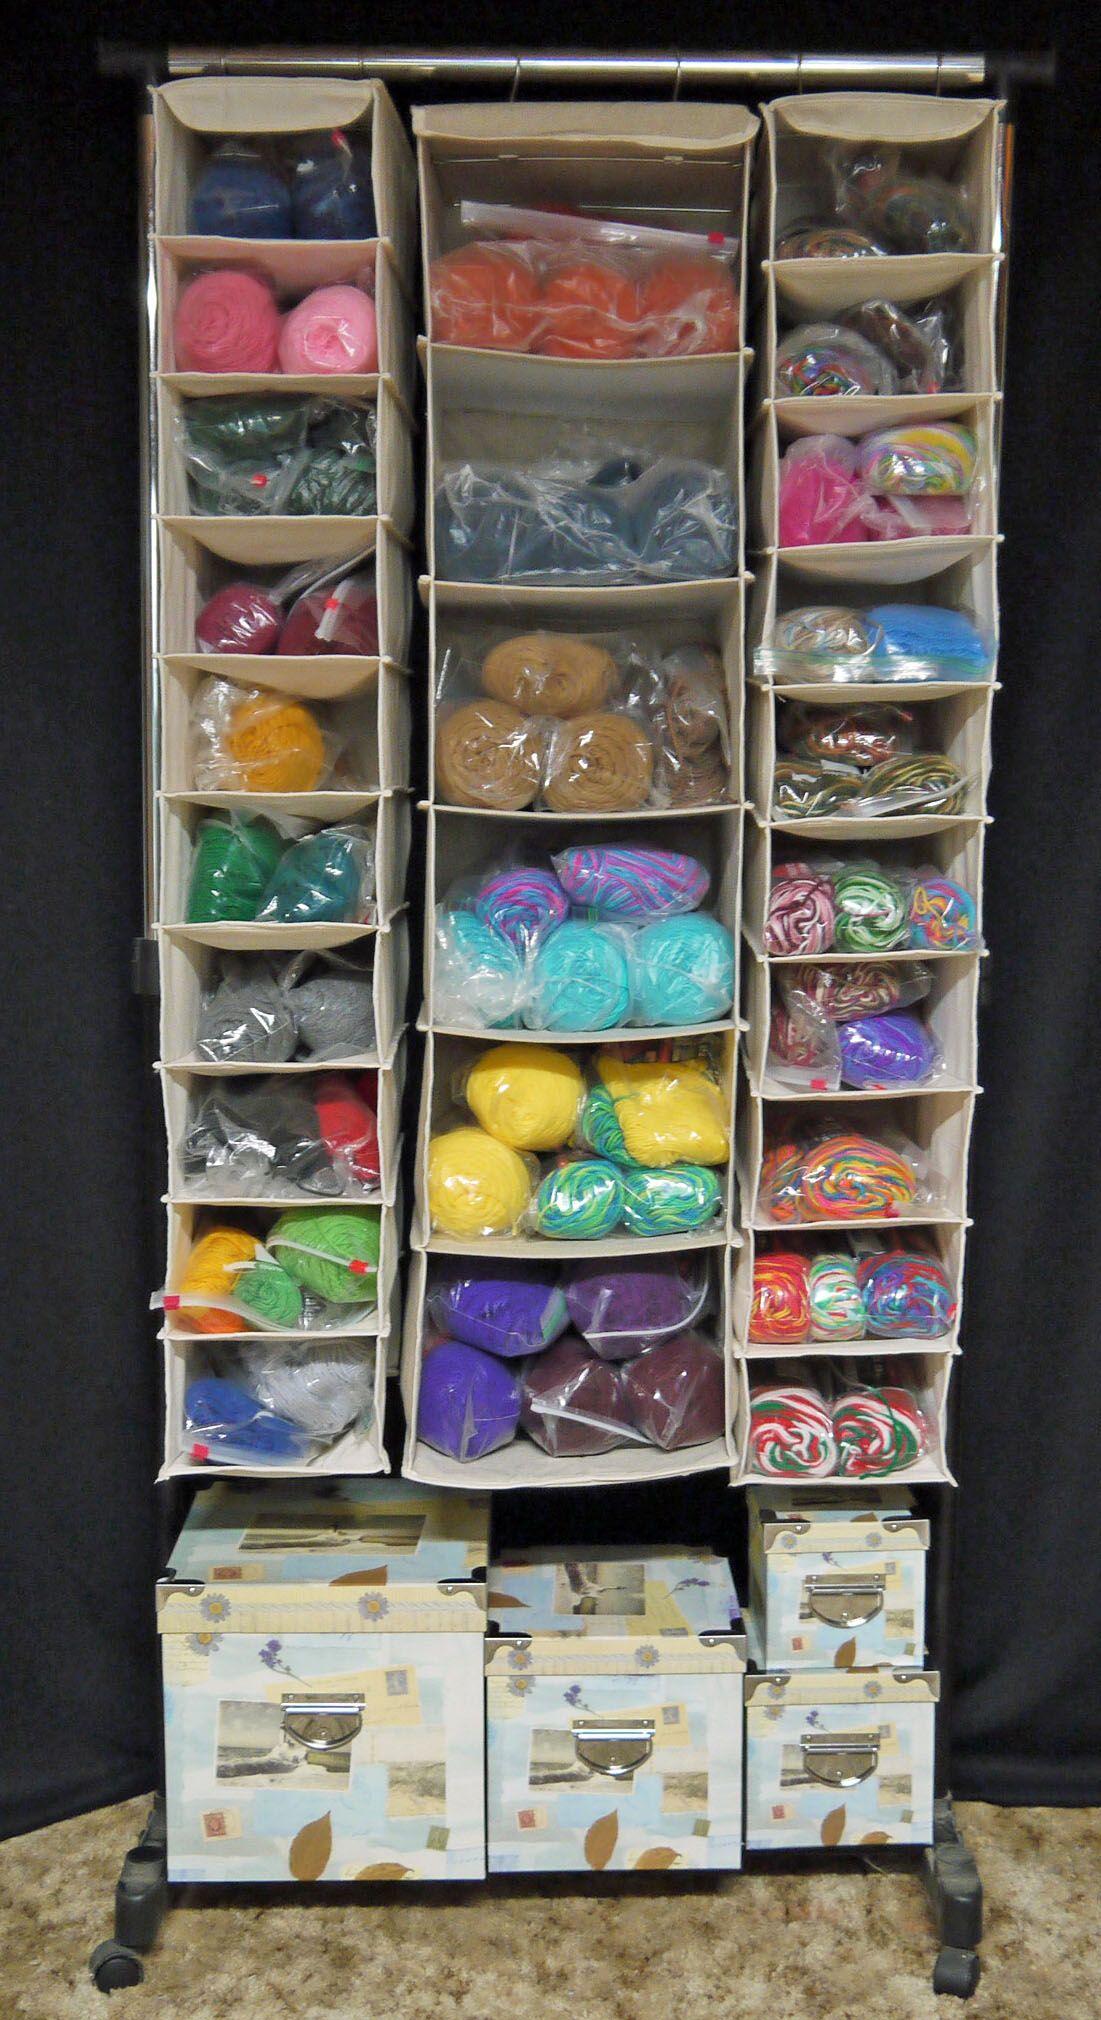 1 Rolling Garment Rack + 1 Hanging Sweater Organizer + 2 Hanging Shoe  Organizers U003d 1